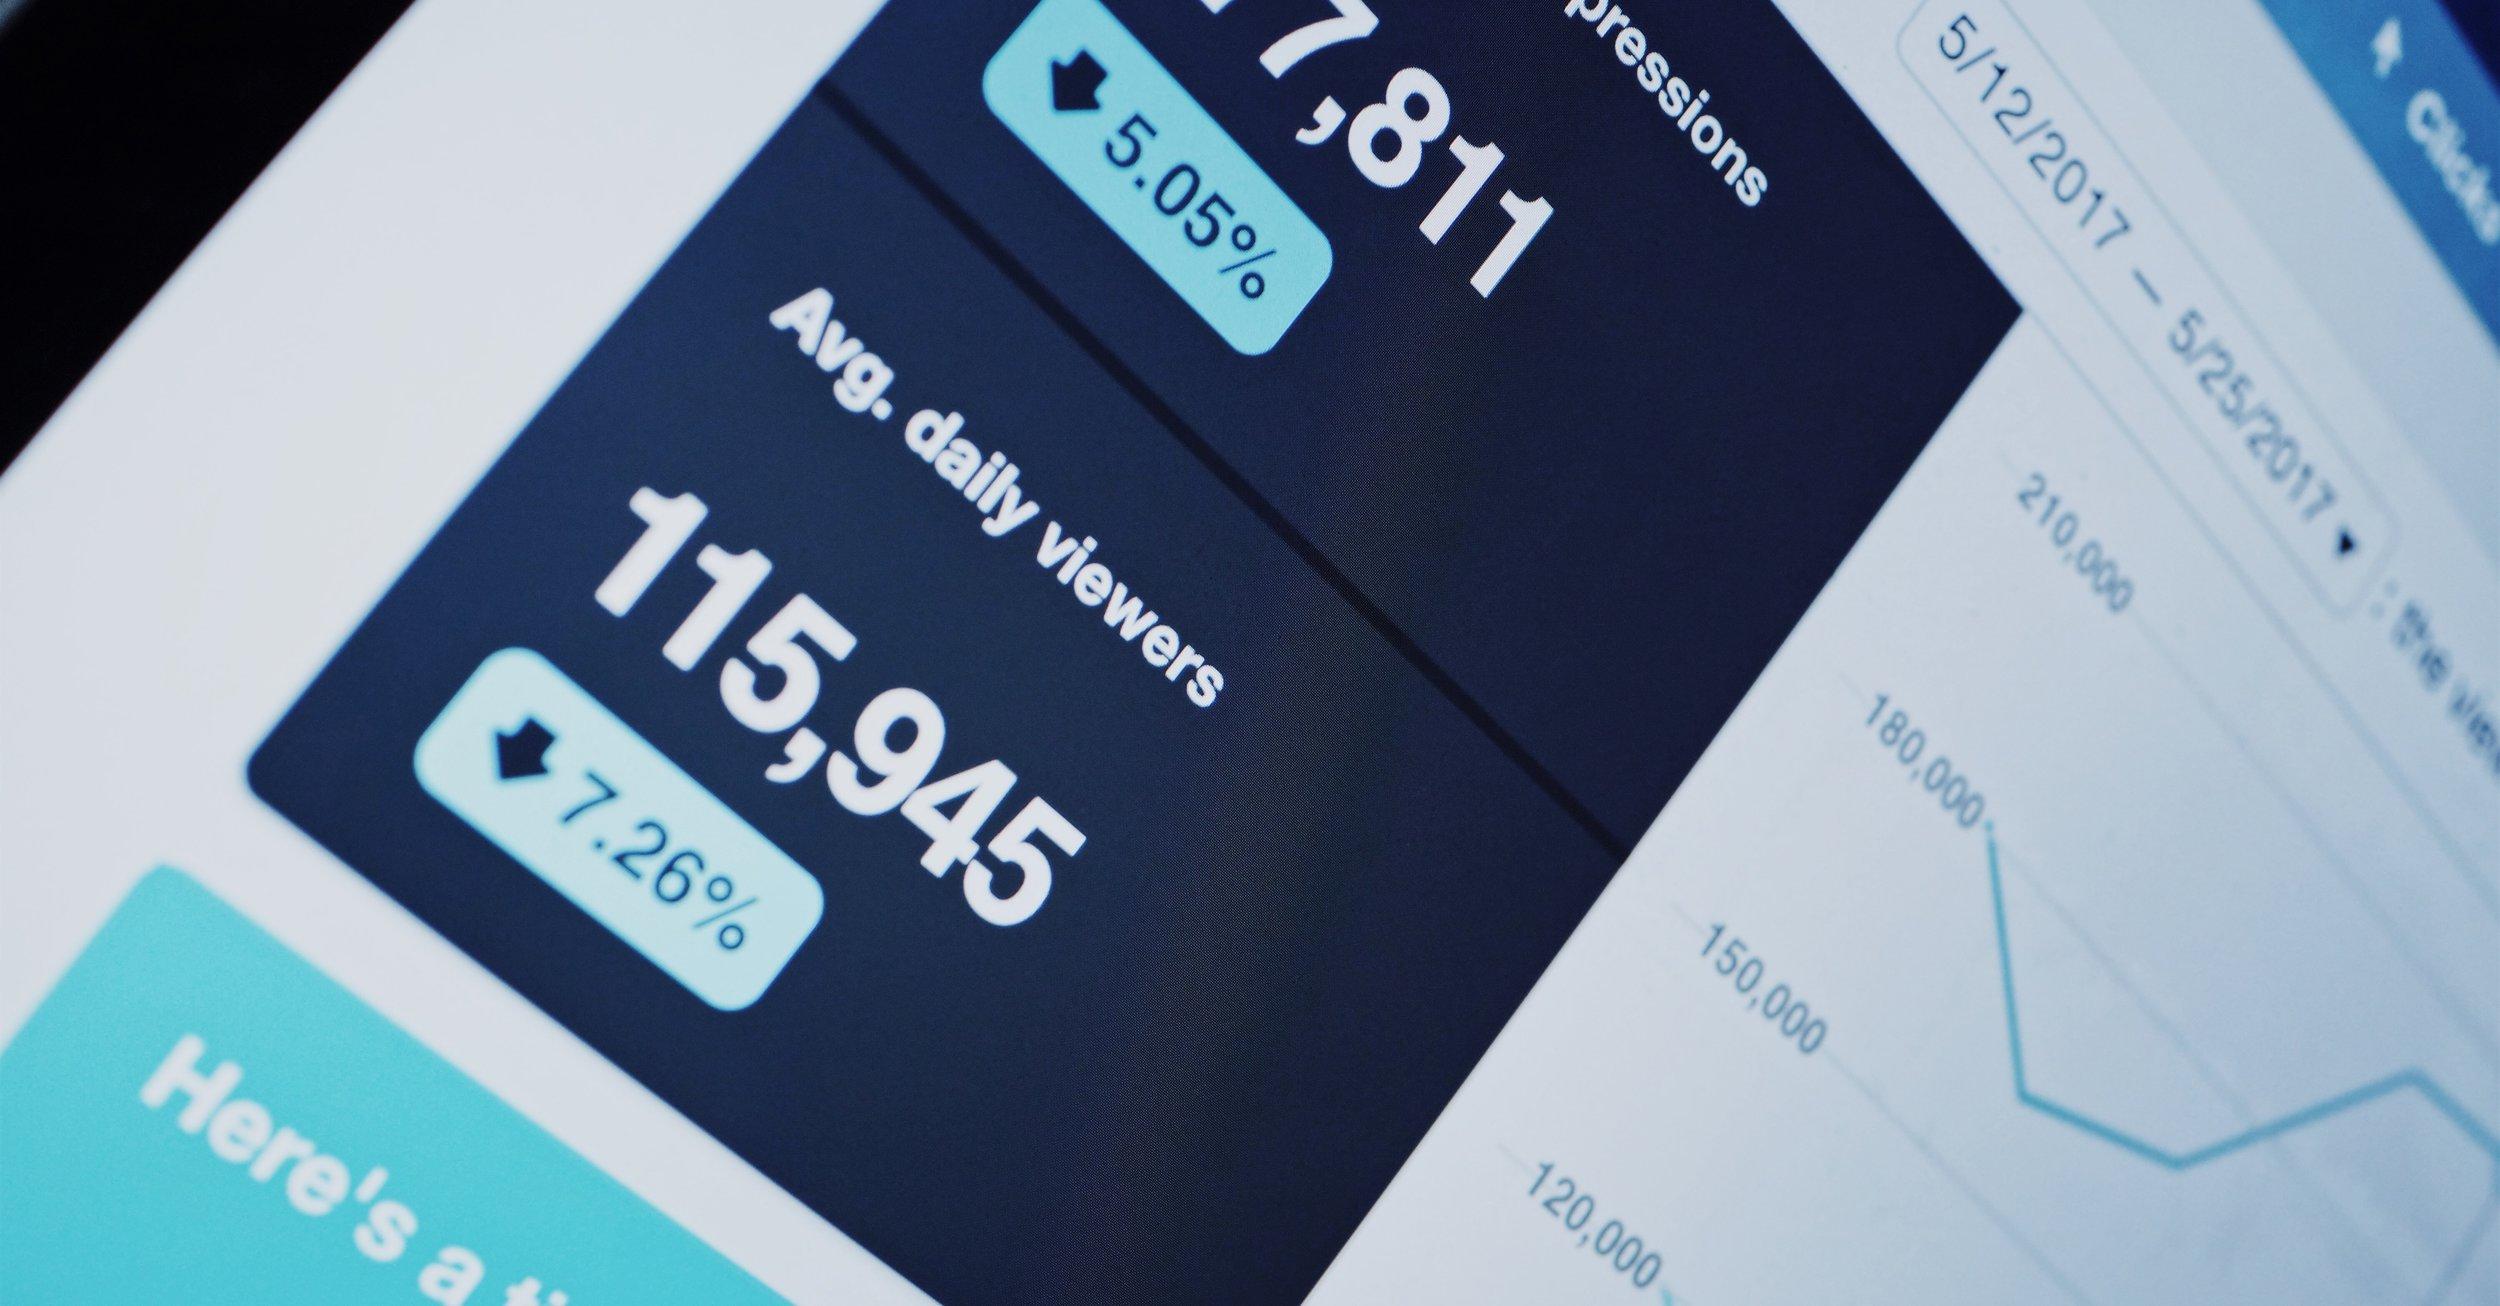 Halston Marketing - The Best Social Platform For B2B  B2B companies -min.jpg